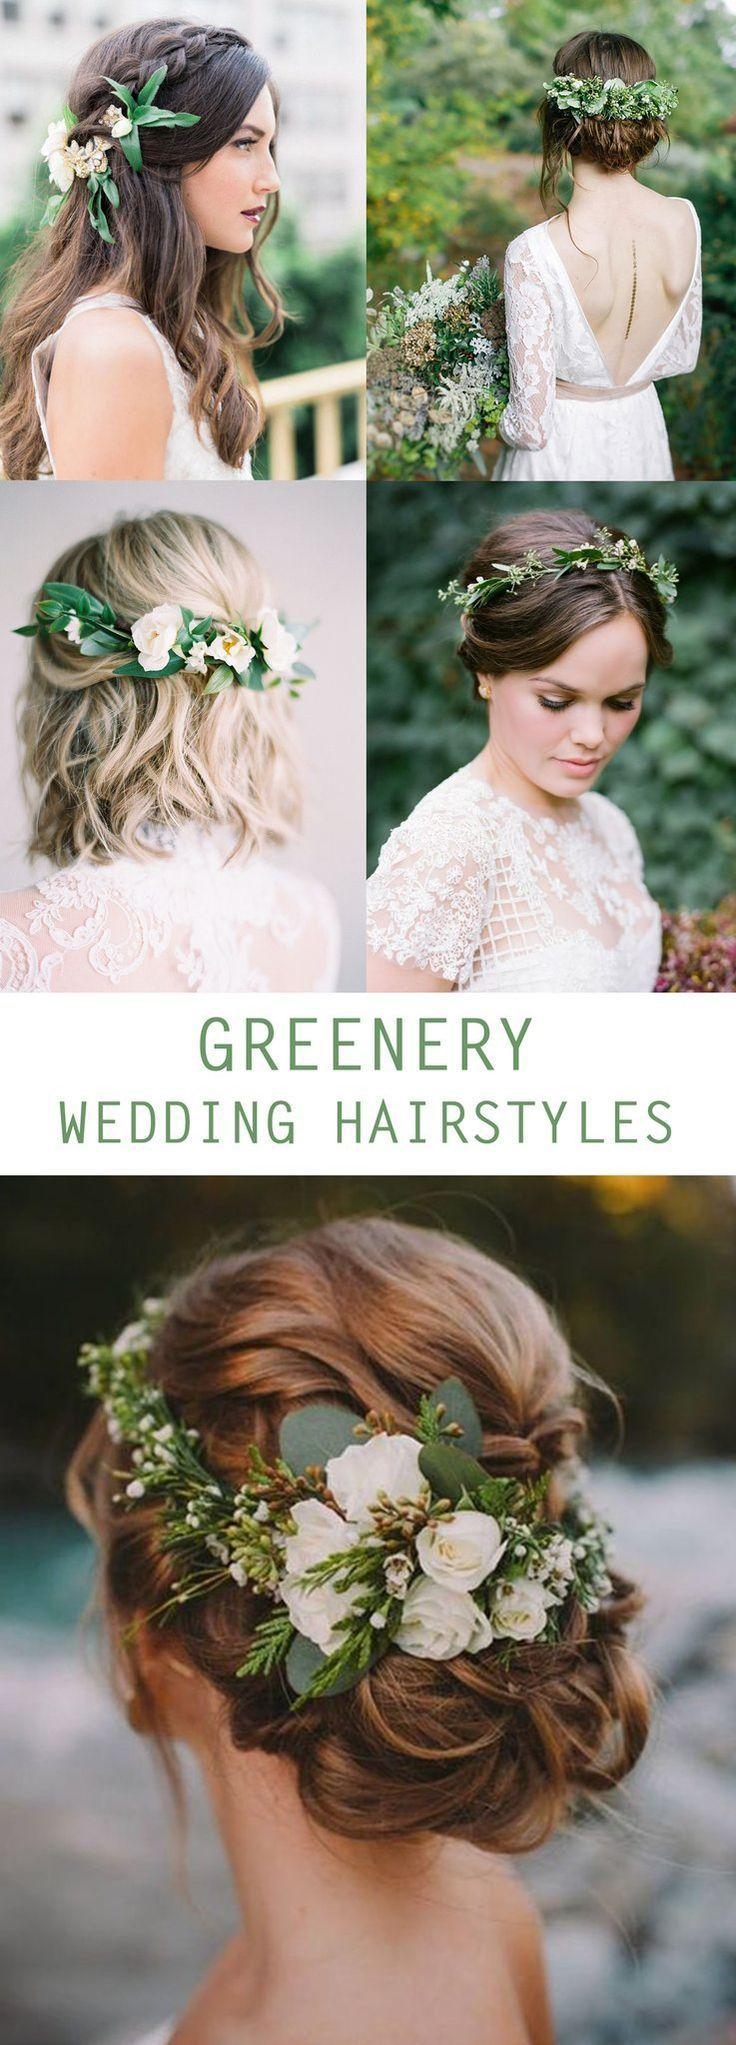 Top Greenery Wedding Ideas